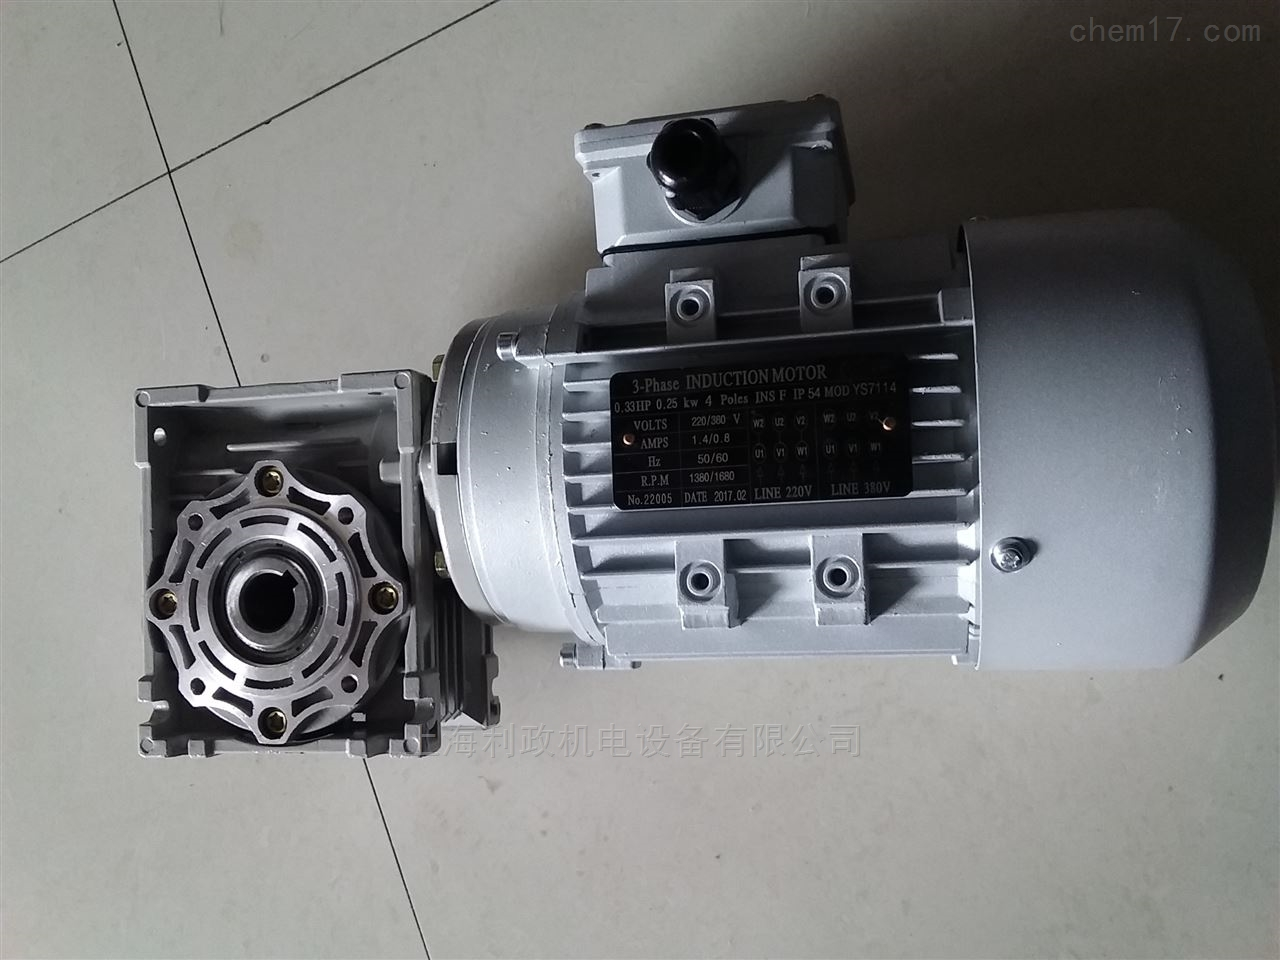 1.5KW铝合金涡轮蜗杆减速电机 RV减速箱